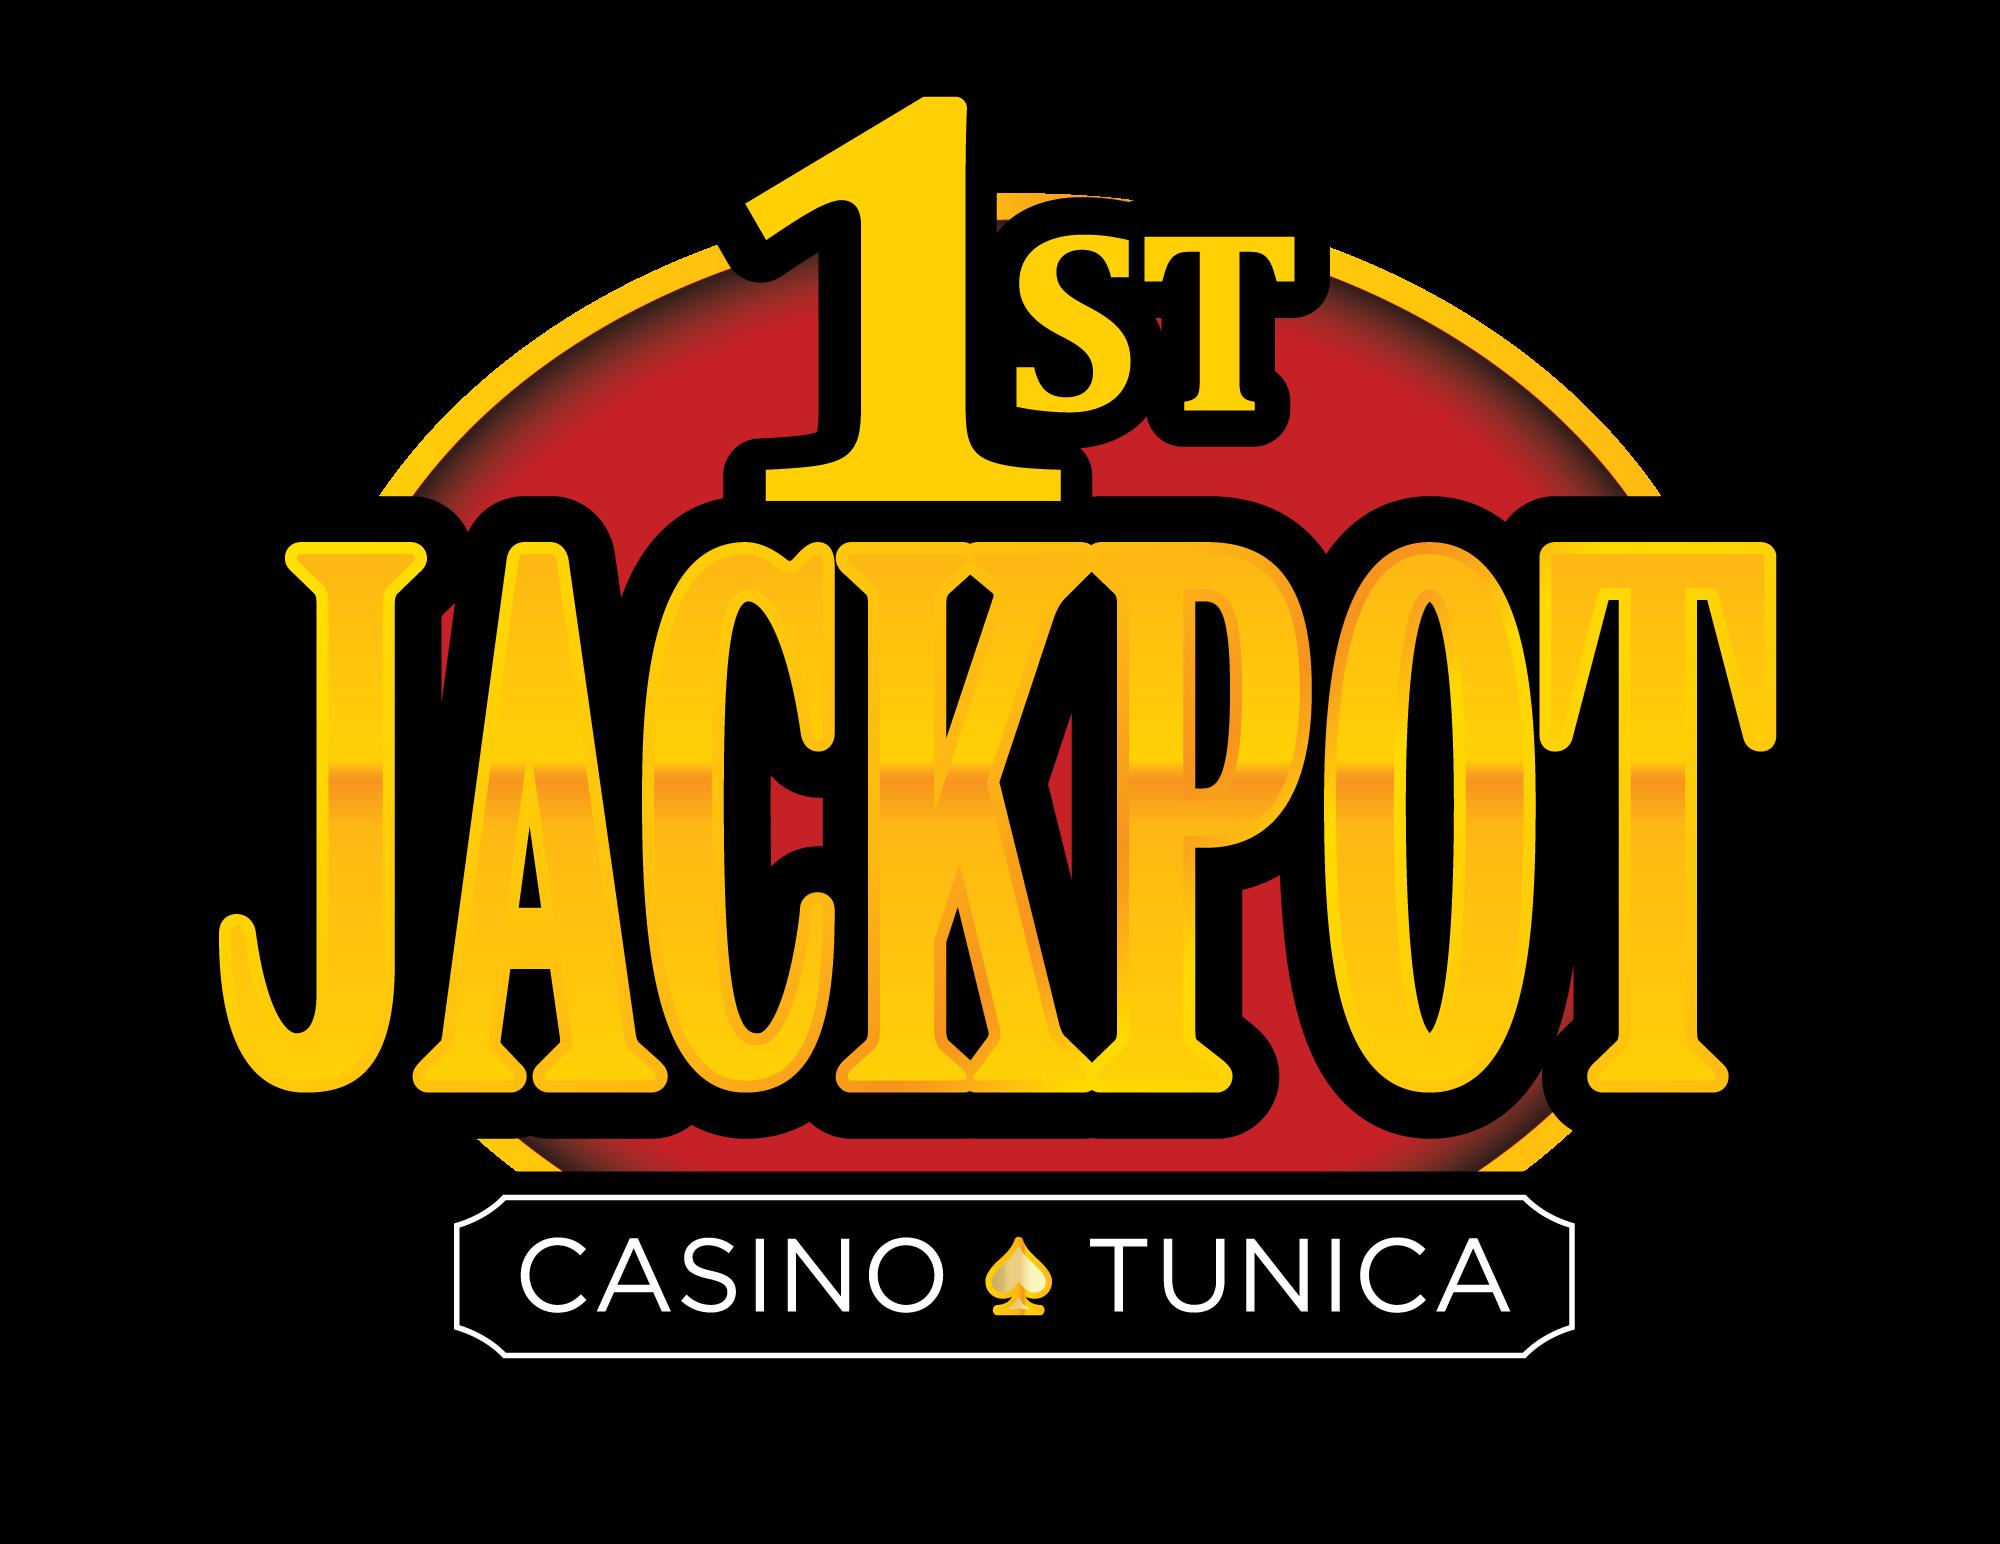 1st Jackpot